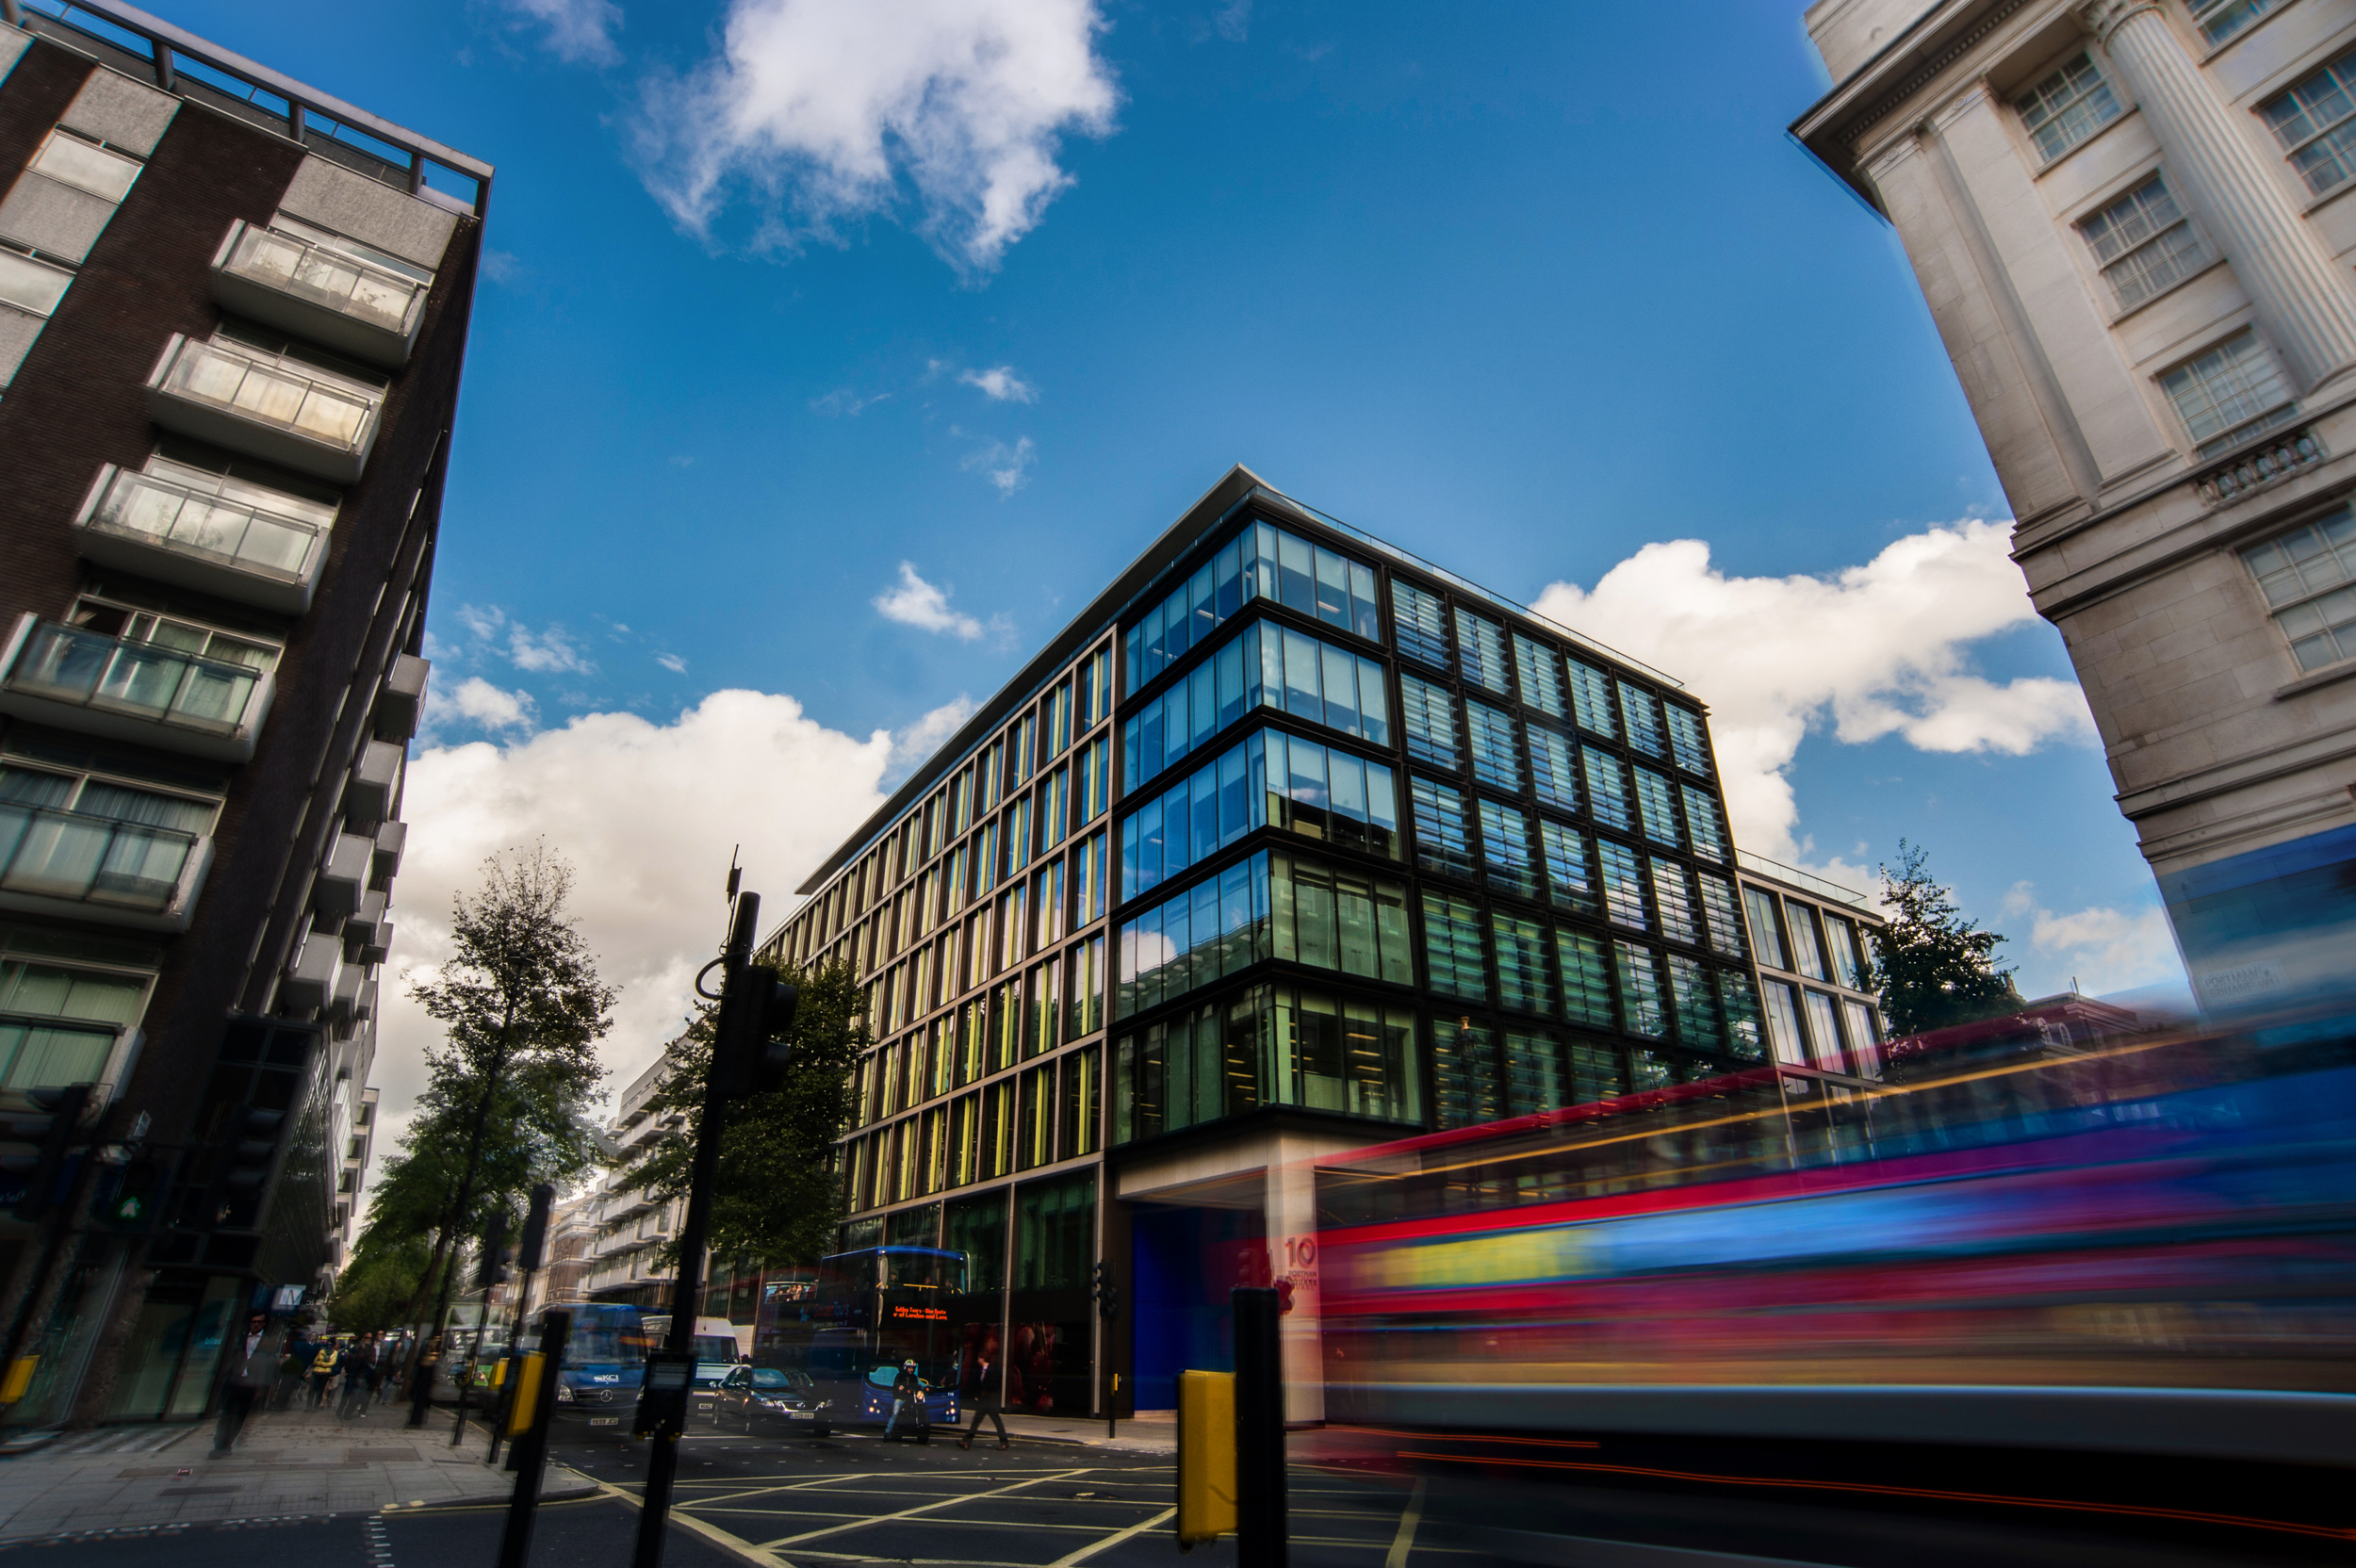 Creative London Commercial Photographer